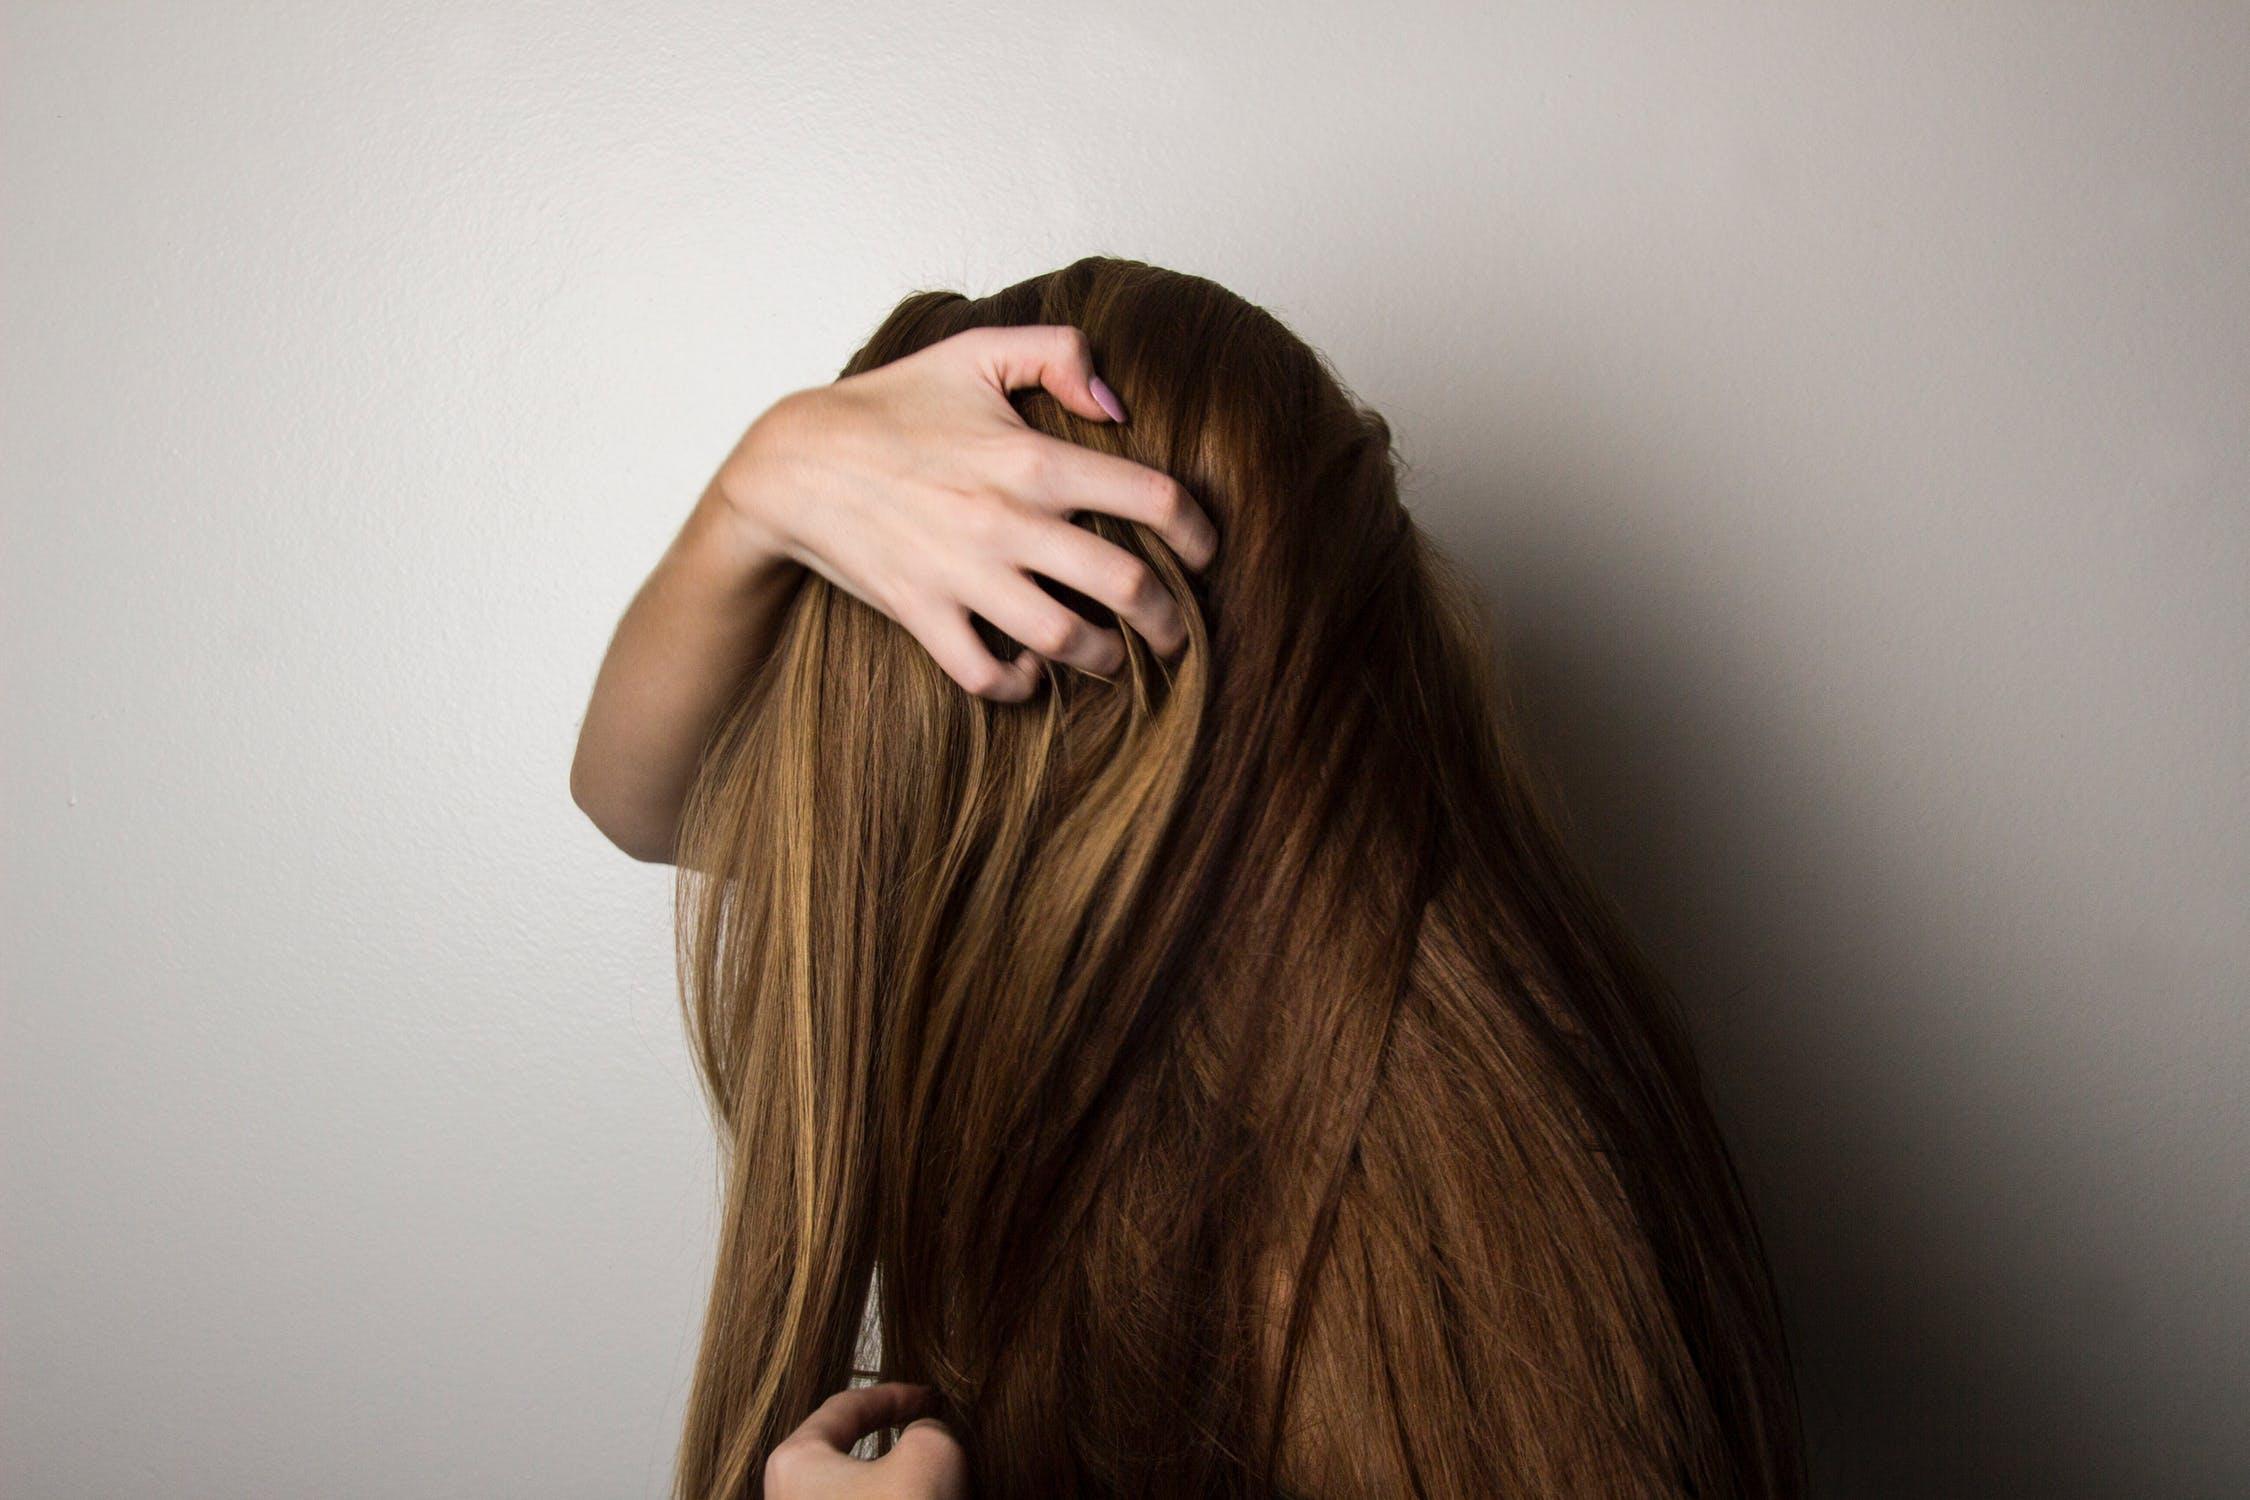 cheveux qui grattent chevelure